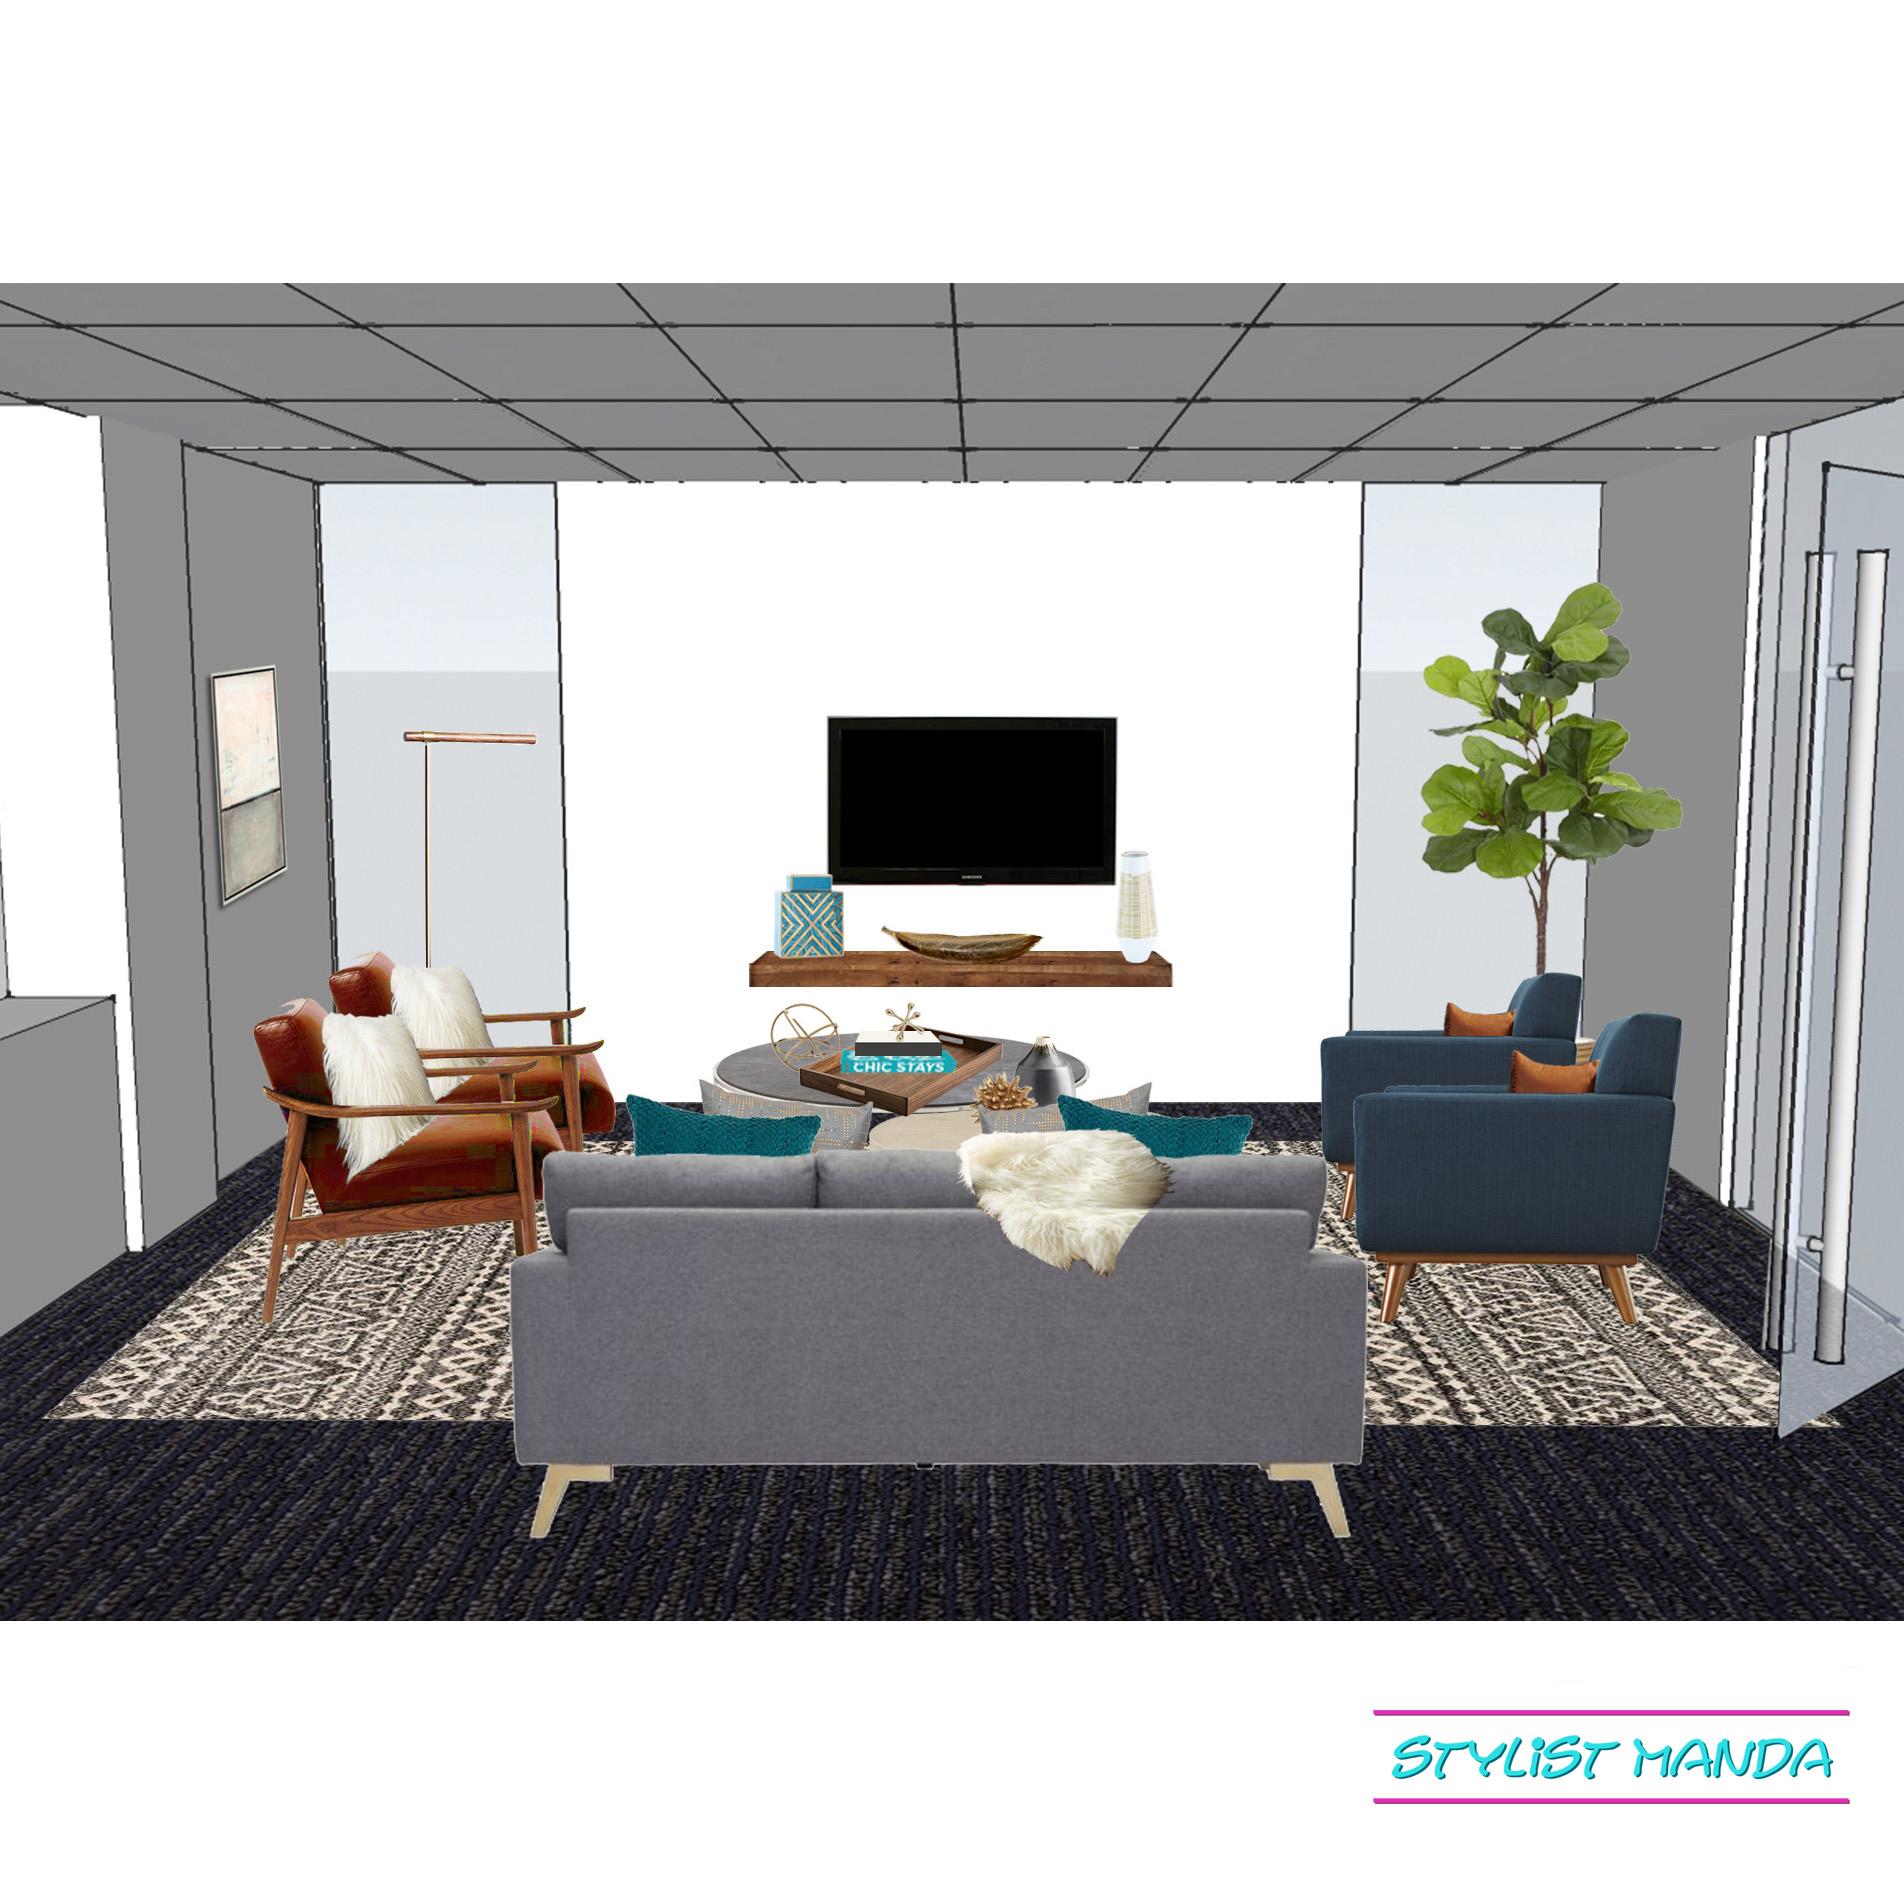 Room View Option 2